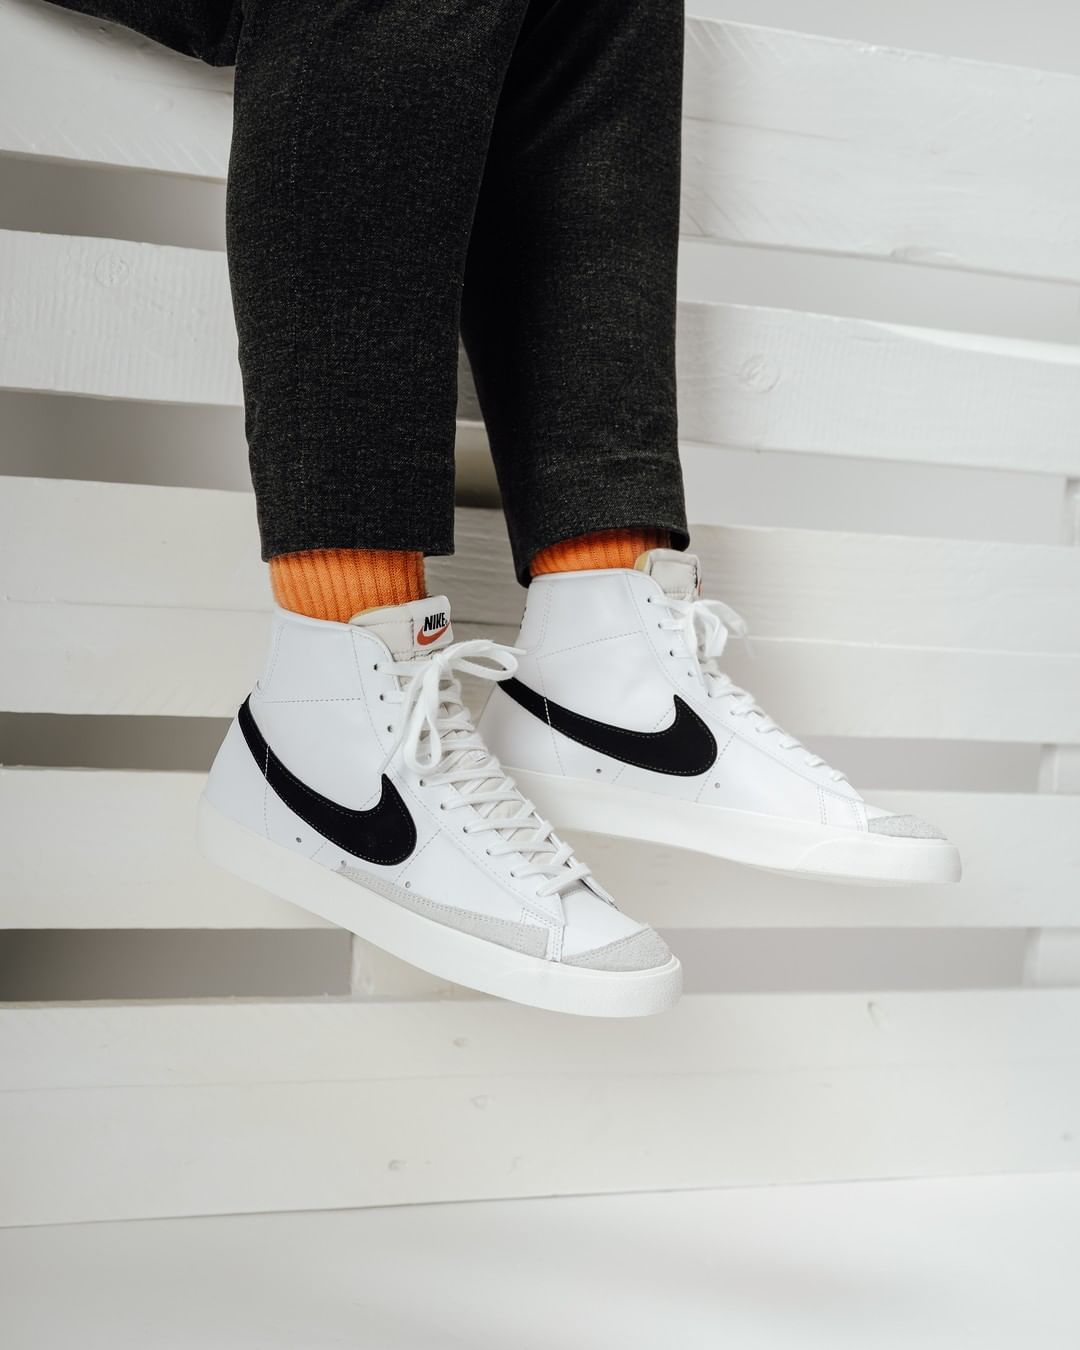 Retro sneakers, Nike blazer